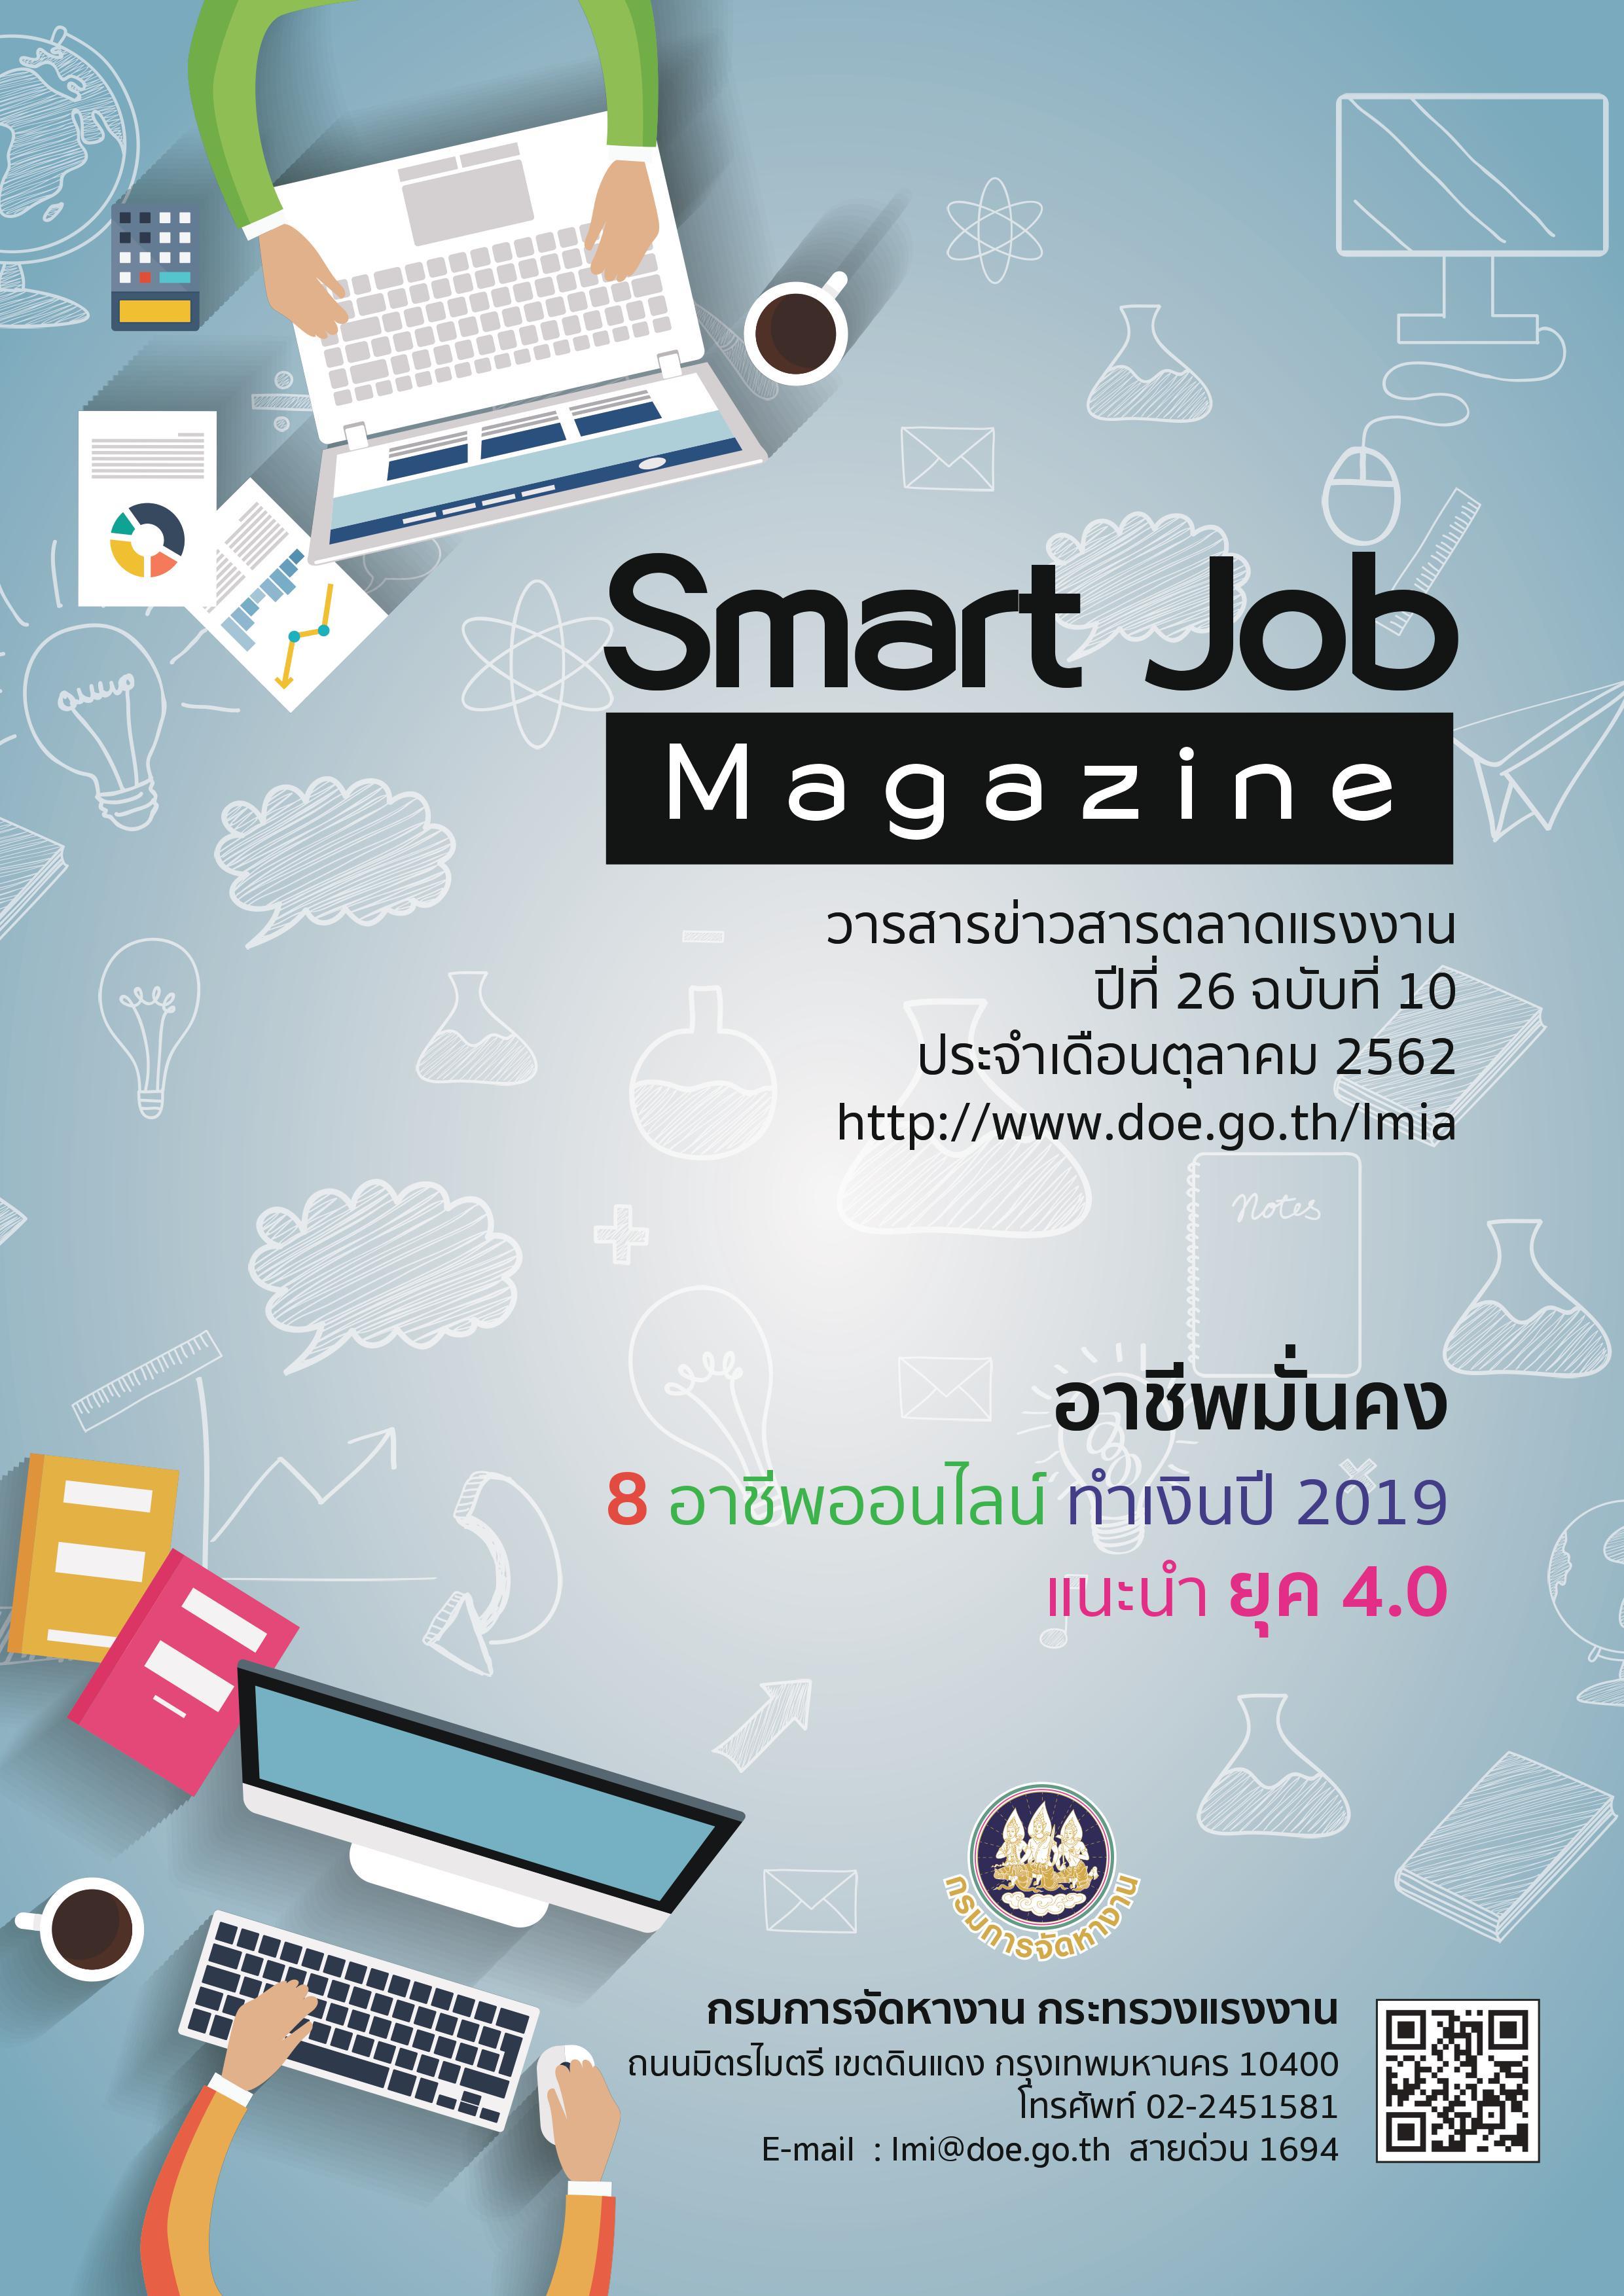 Smart Job Magazine วารสารสถานการณ์ตลาดแรงงาน ปีที่ 26 ฉบับที่ 10 ประจำเดือนตุลาคม 2562